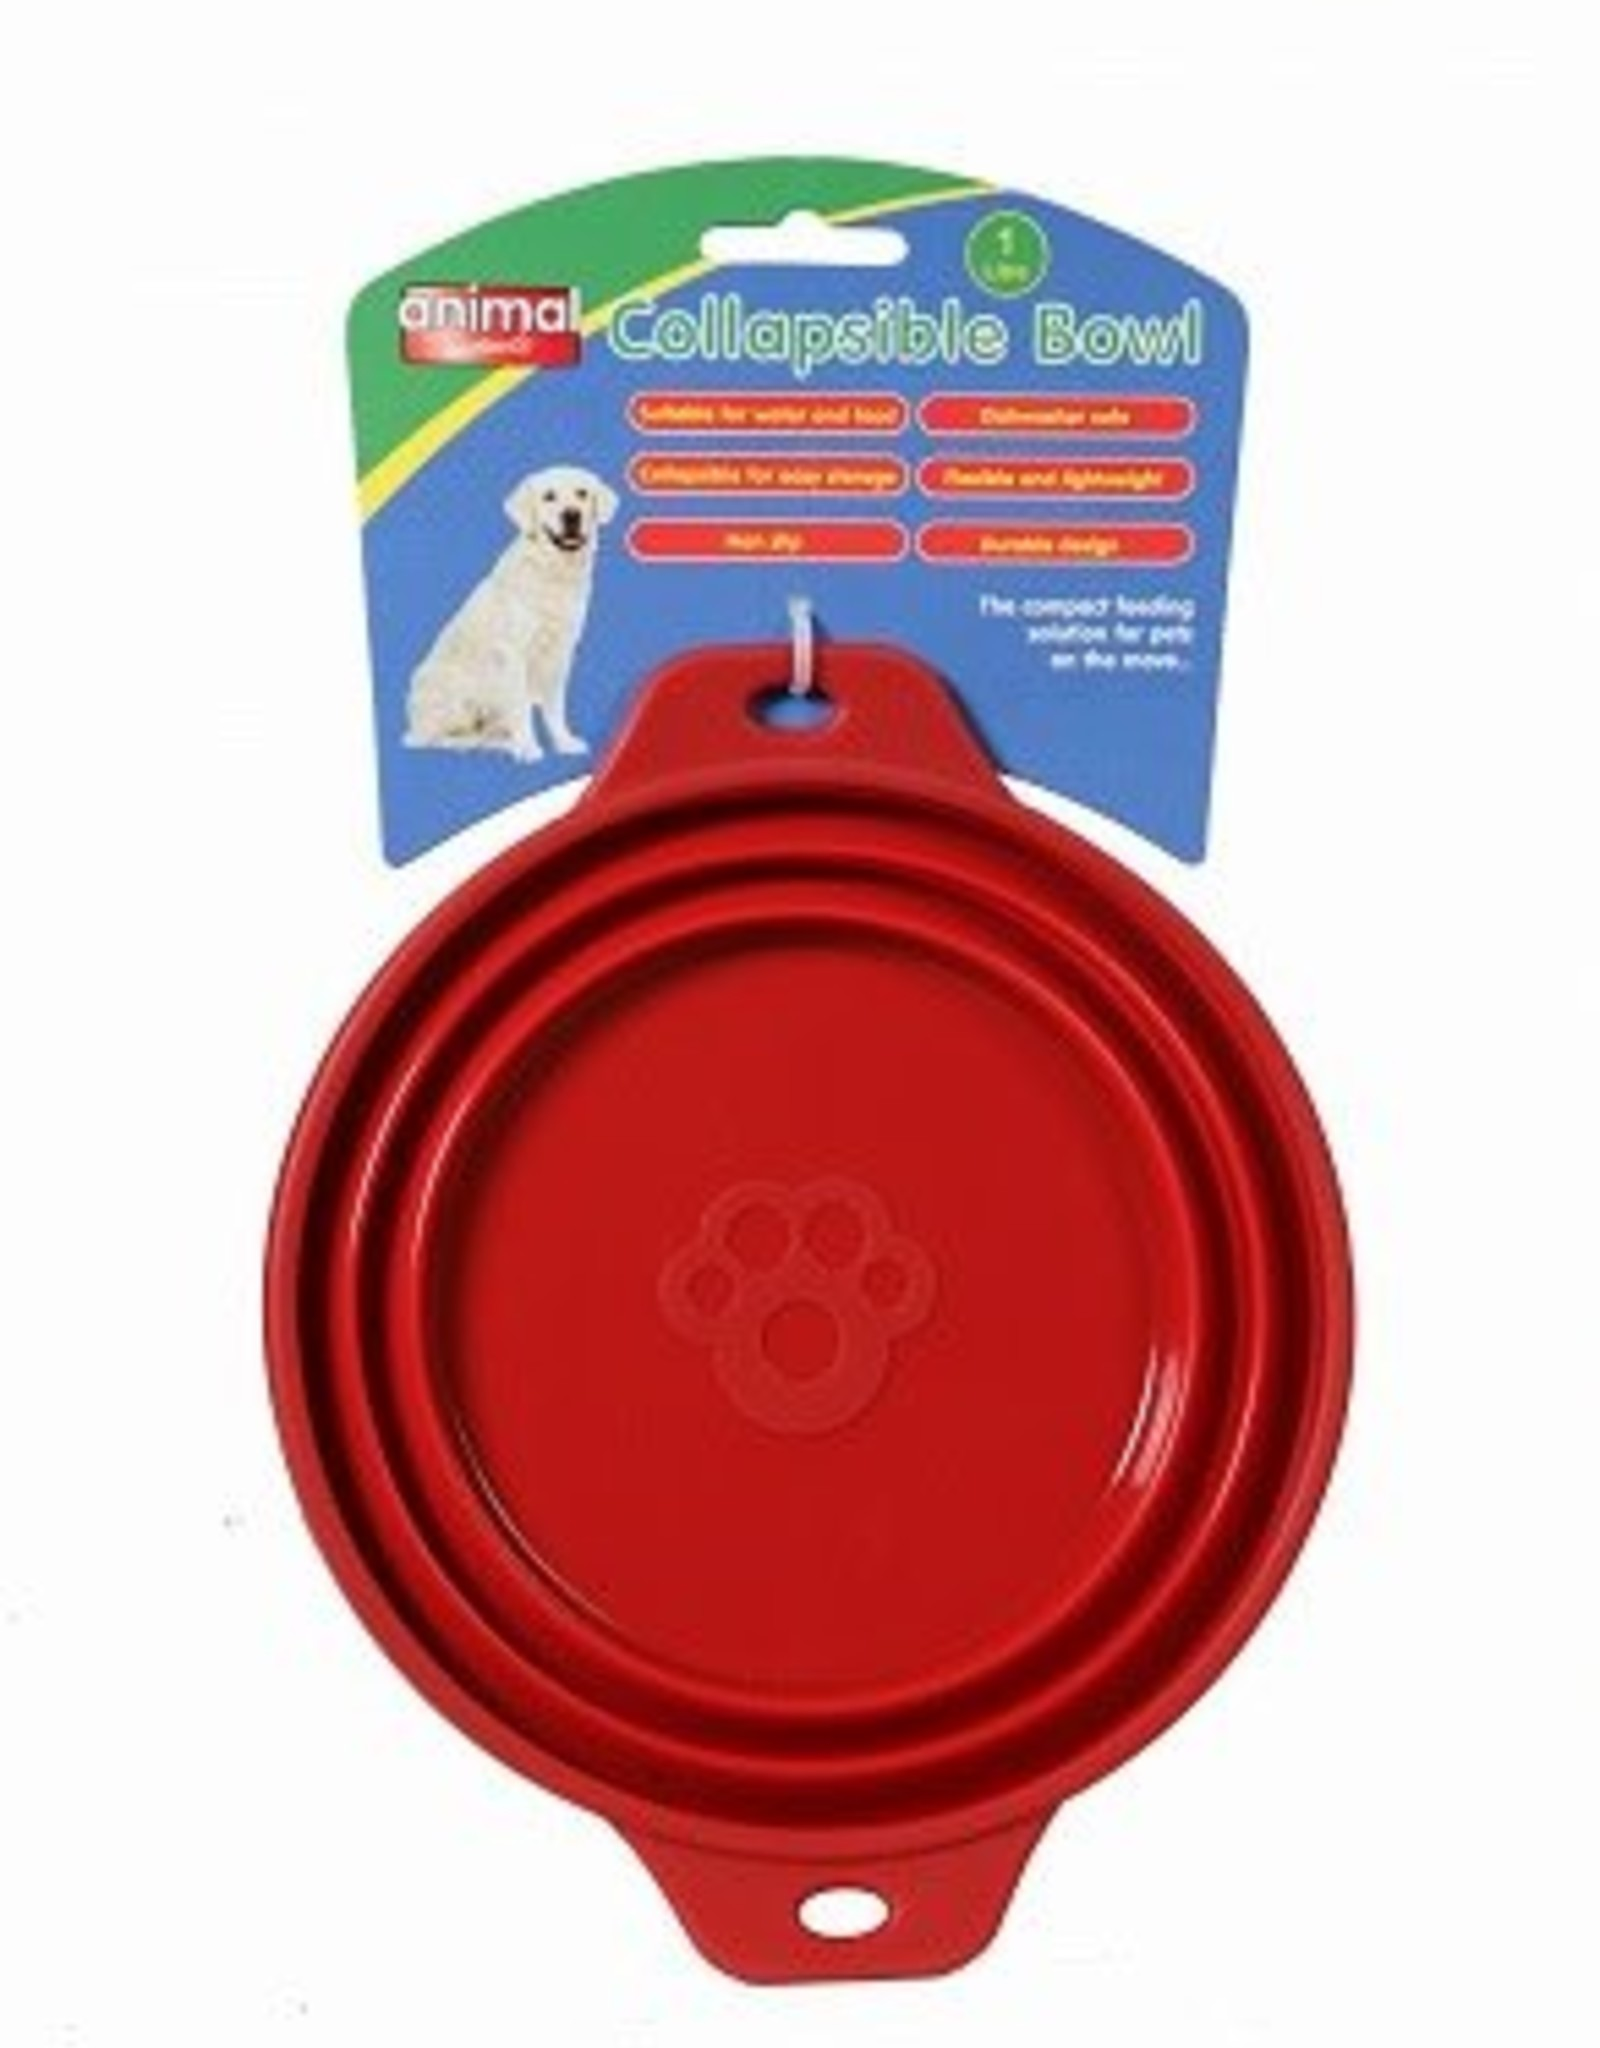 Animal Instincts Travel Collapsible Dog Bowl 1 litre